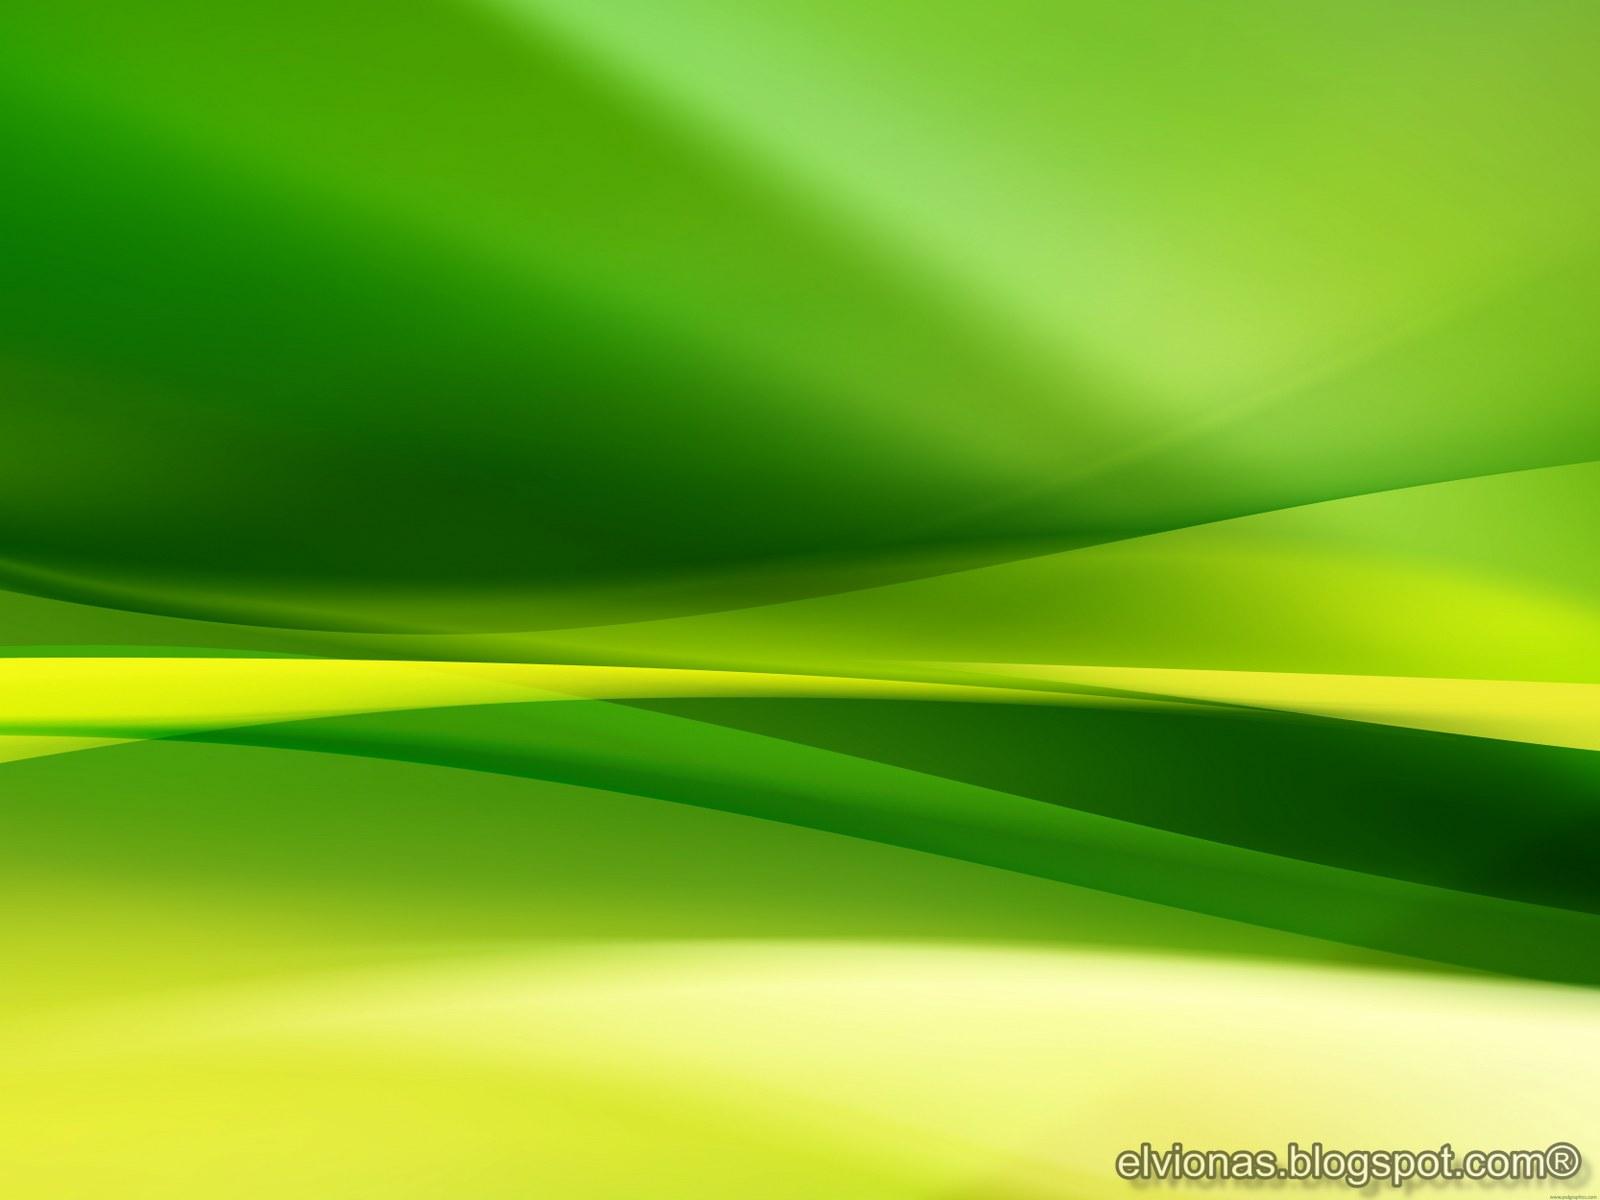 Wallpaper Trends Green Images Vector Background 1600x1200